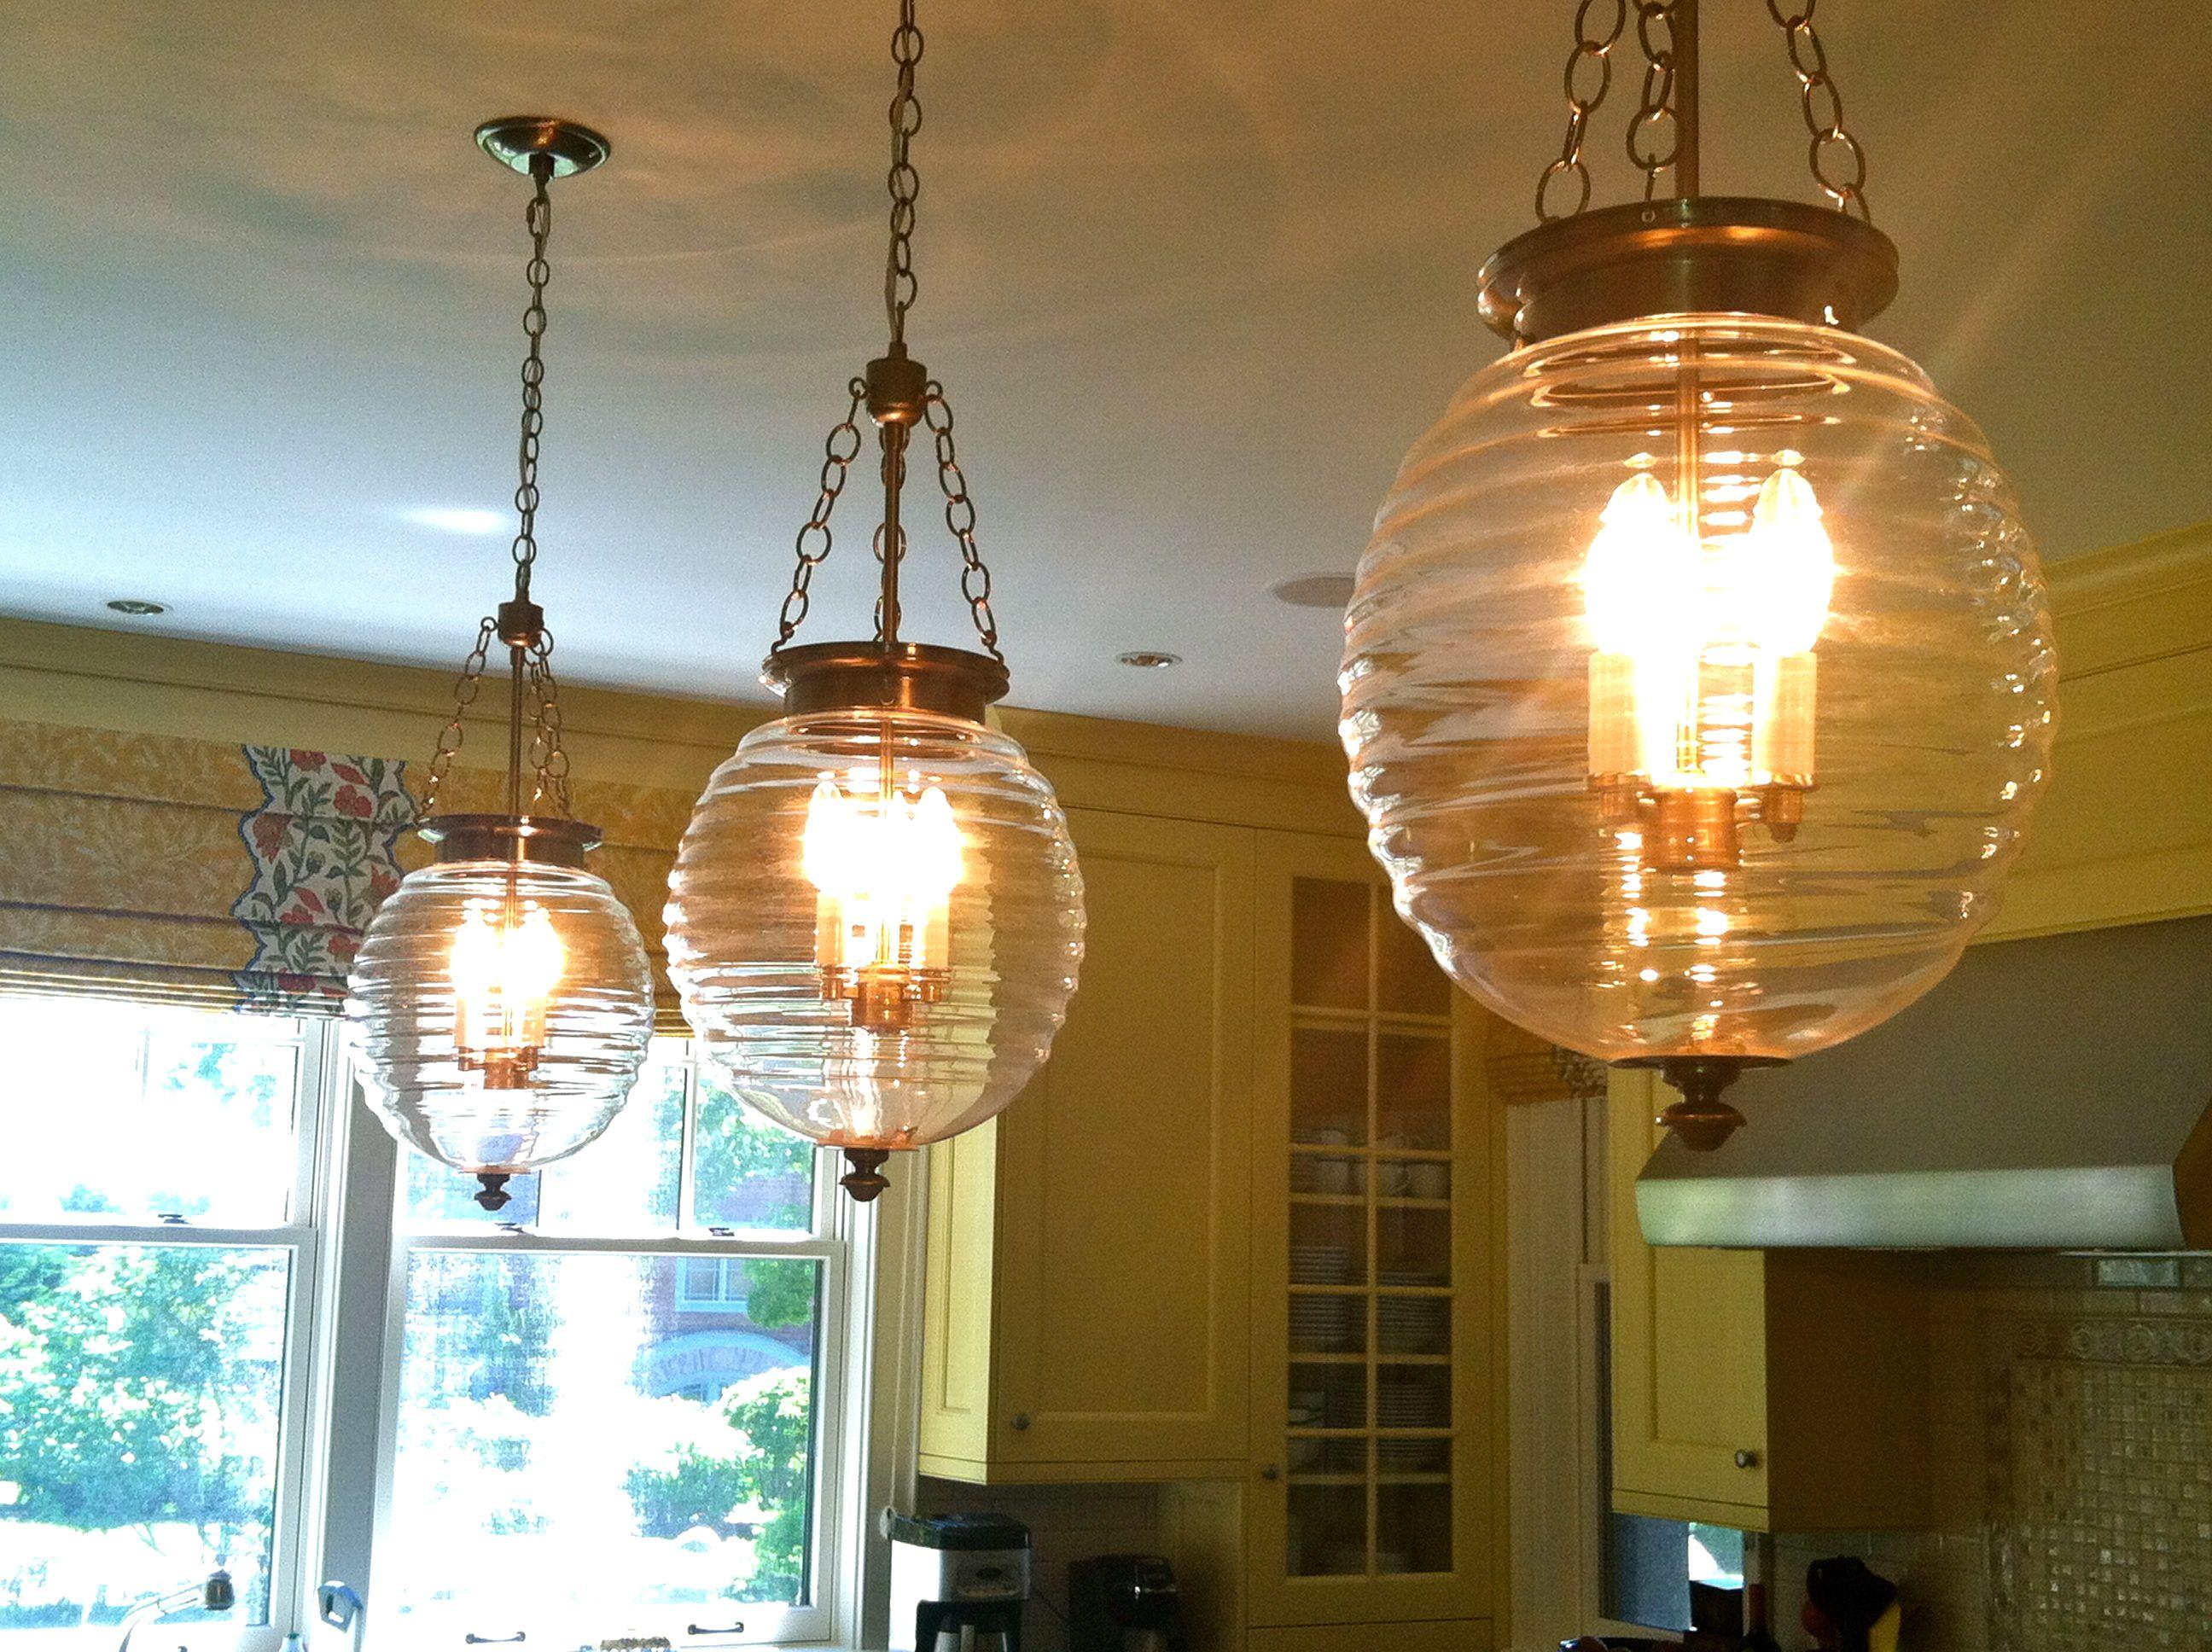 Beehive lamps